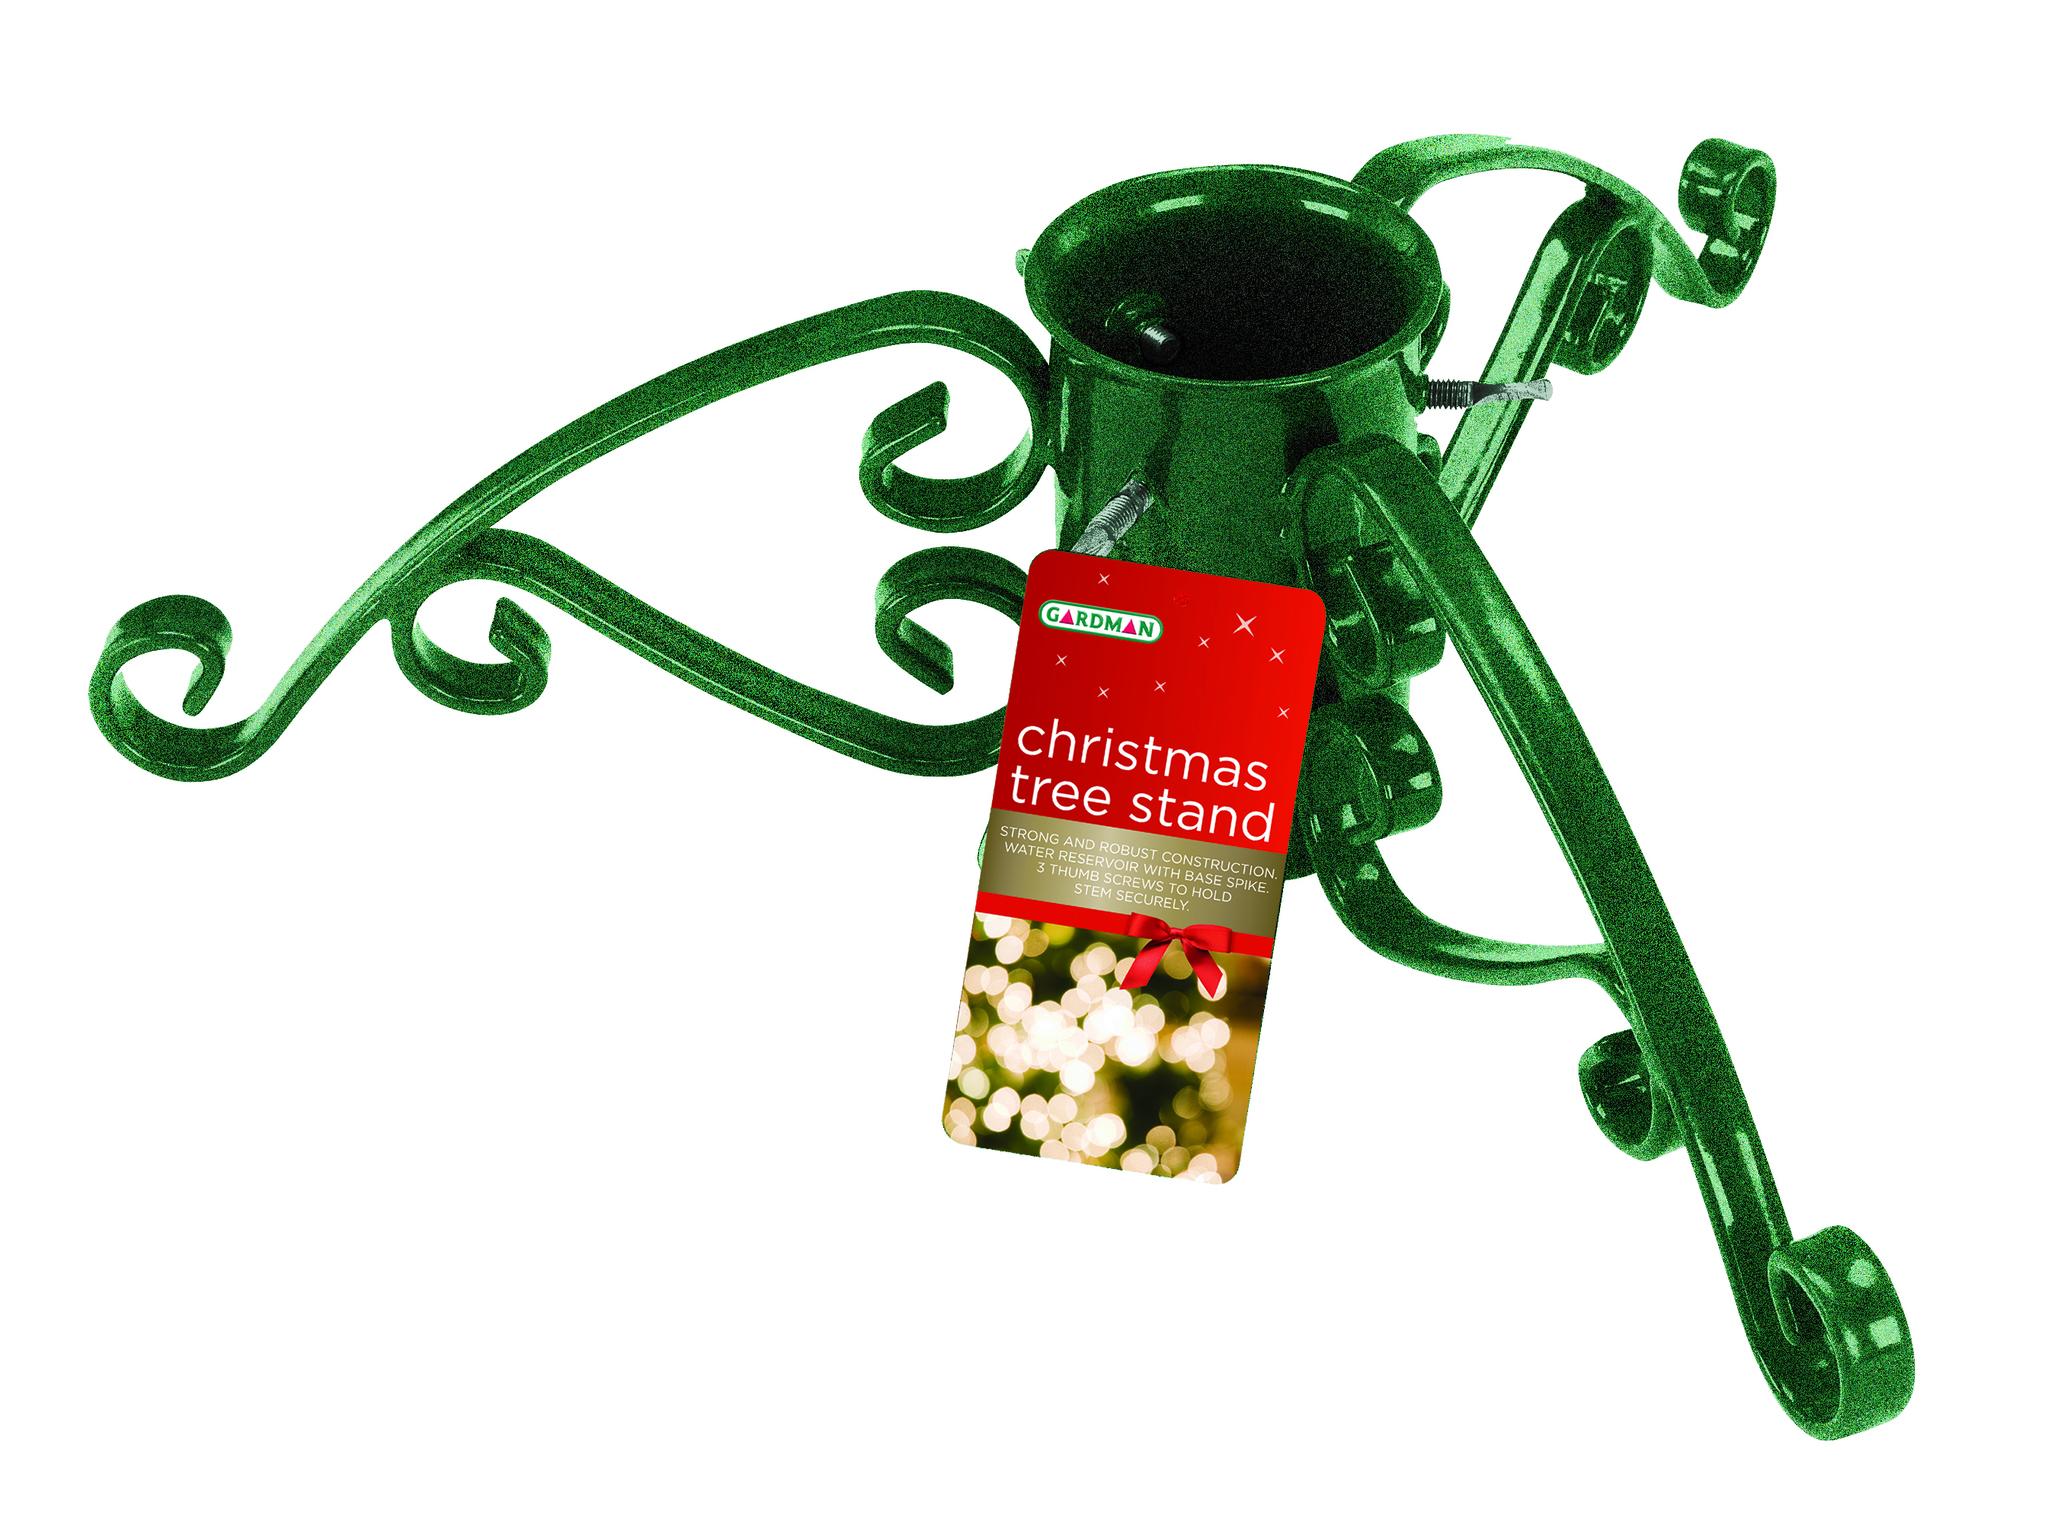 Gardman quot christmas tree stand green sparkle xmas holder